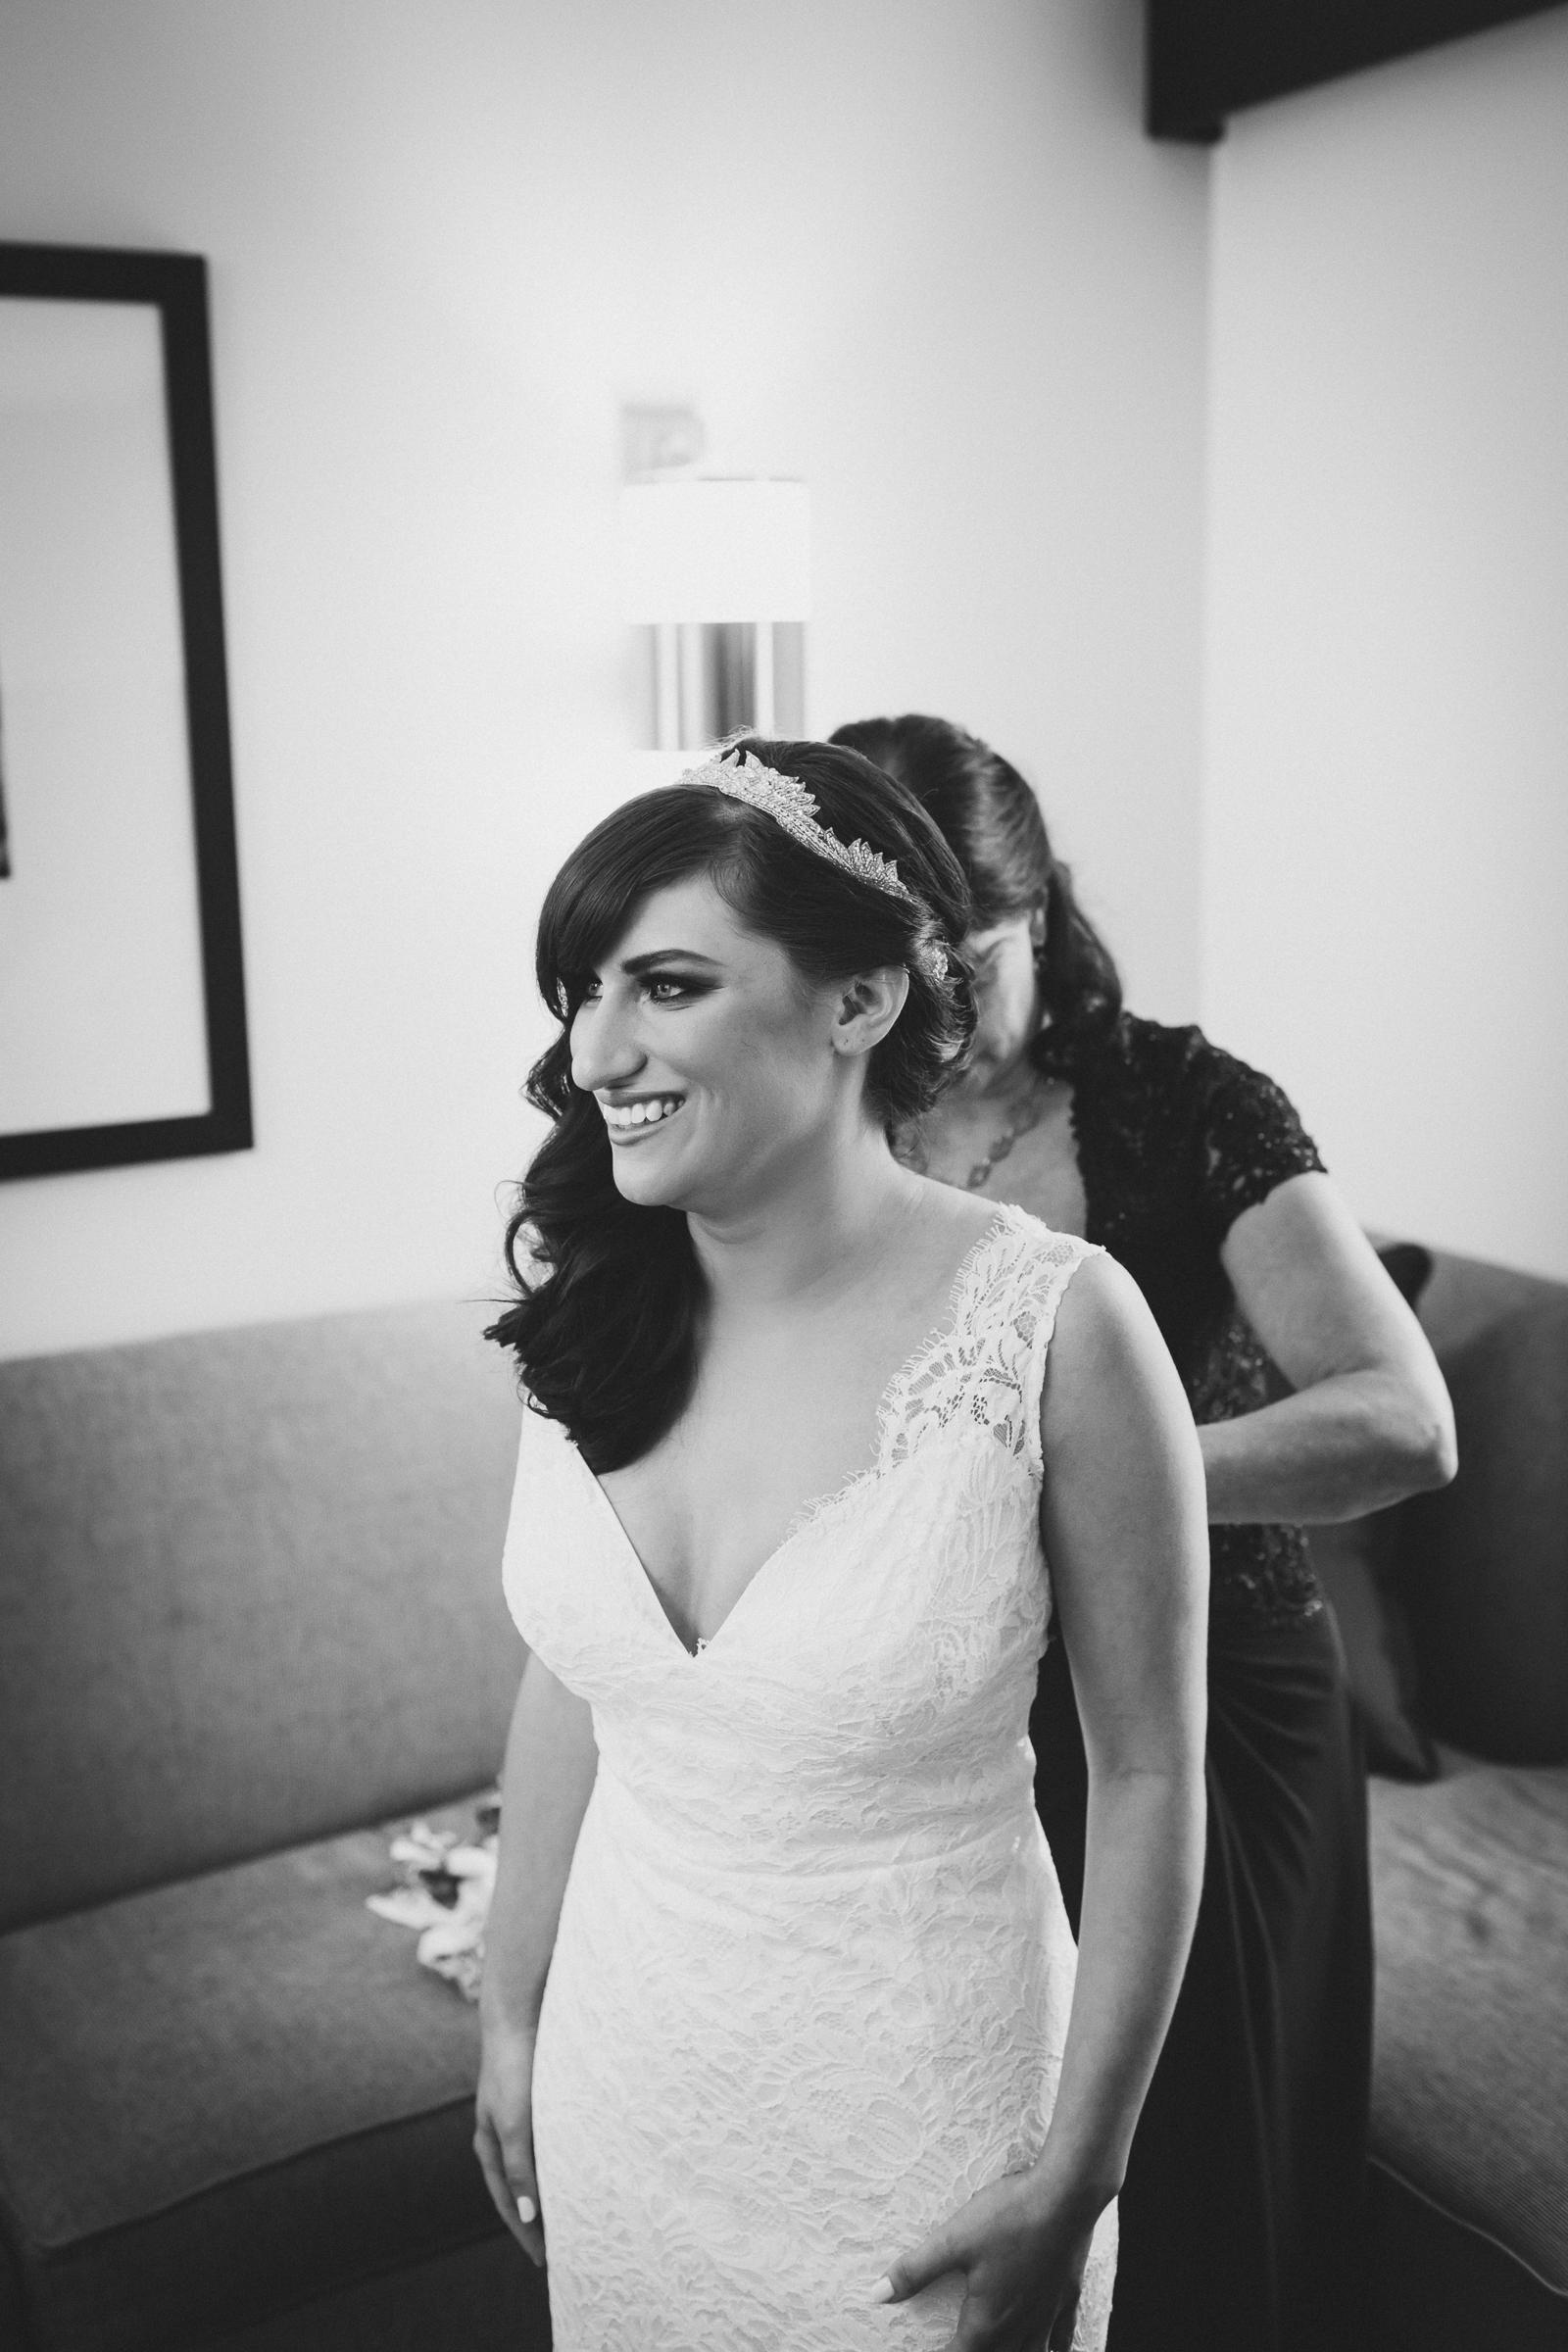 Martha-Clara-Vineyard-Long-Island-Documentary-Wedding-Photographer-5.jpg